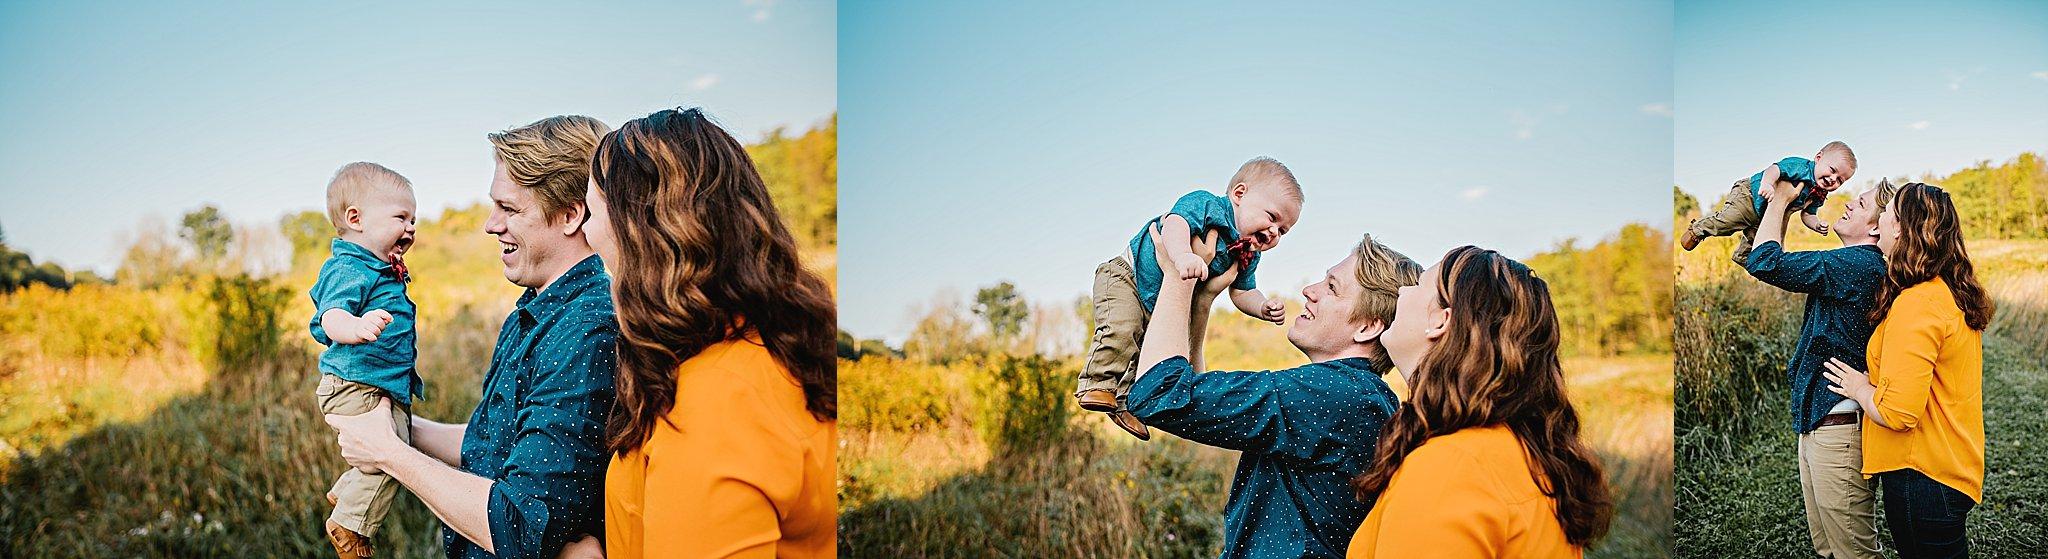 lauren-grayson-photography-ohio-photographer-AKRON-family-photos-gorsage_0939.jpg